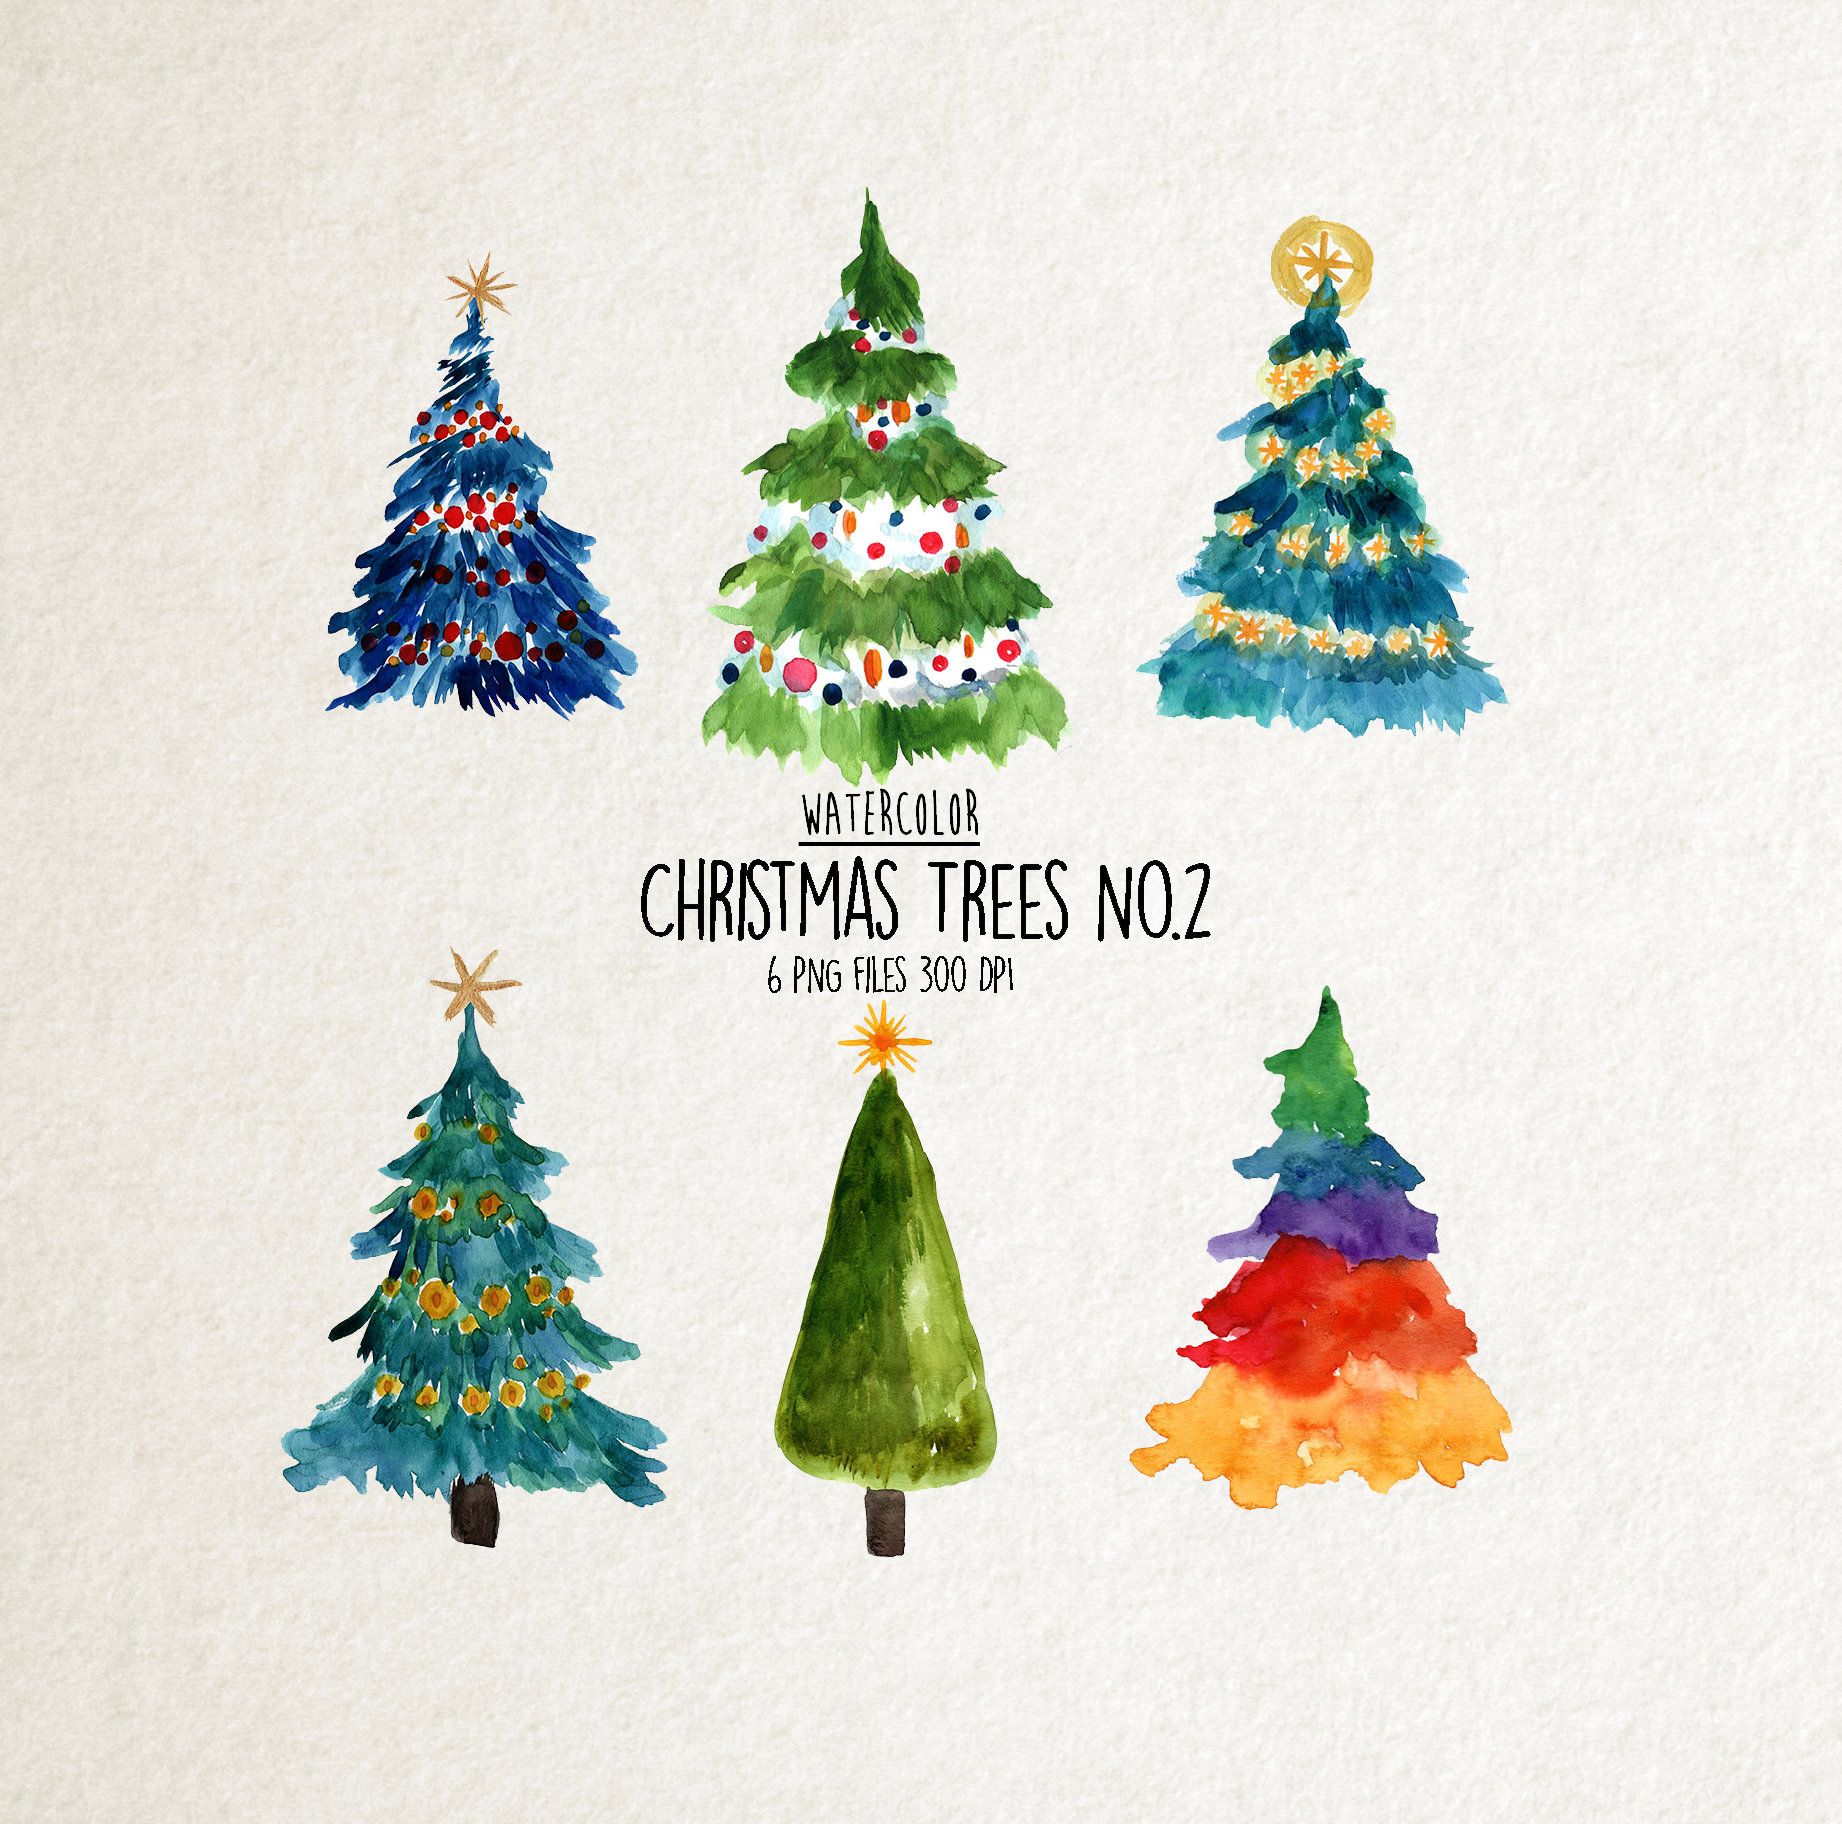 Watercolor christmas trees clipart No.2 watercolor winter   Etsy